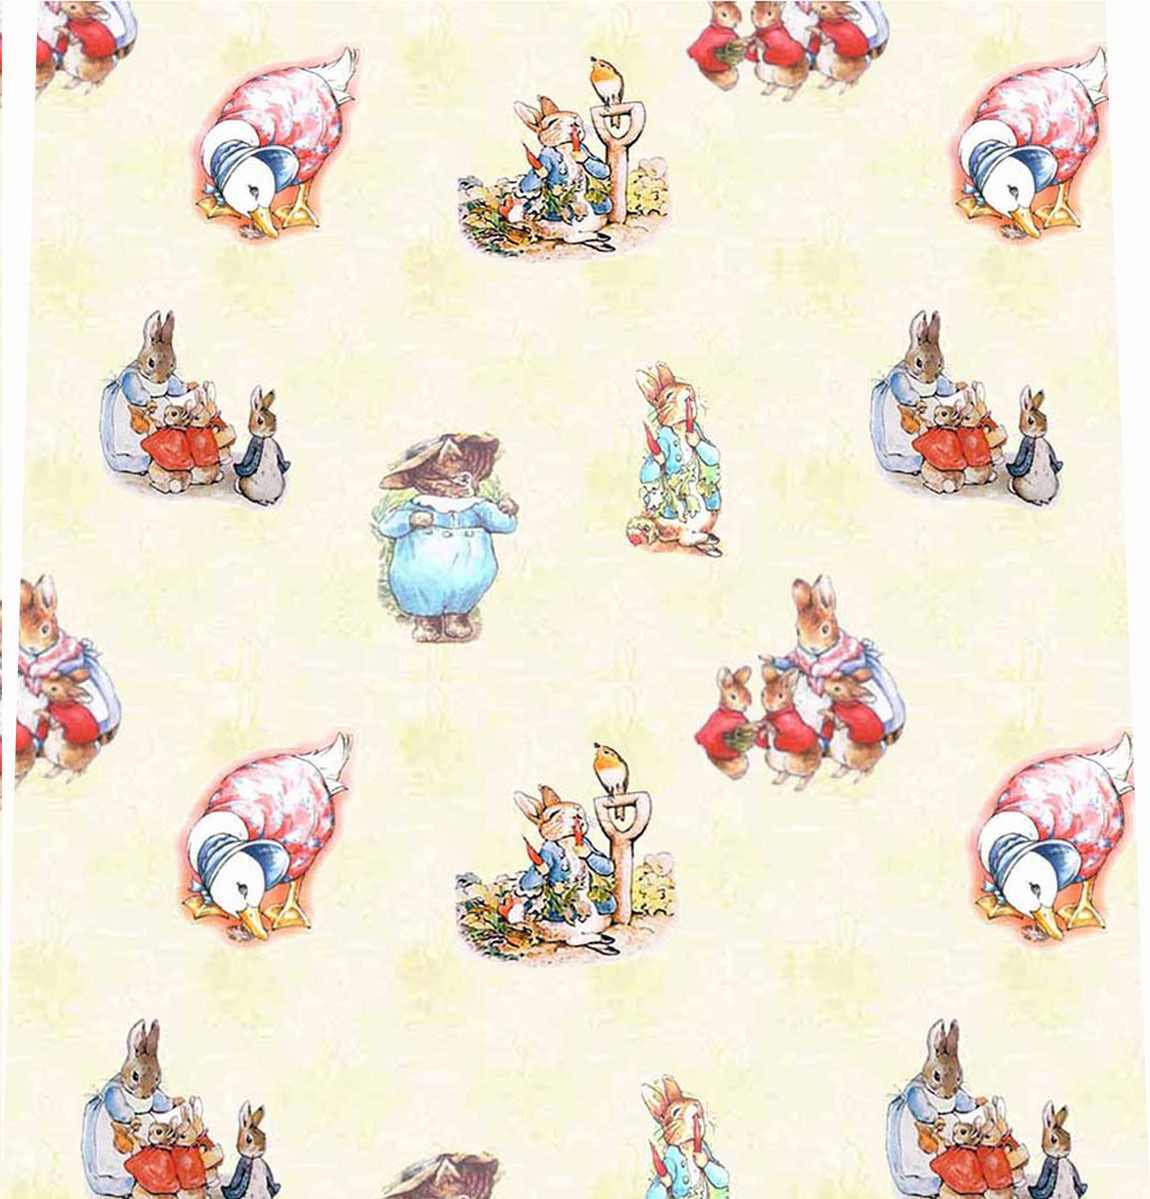 Dolls House Wallpaper 1 12th 1 24th Scale Nursery Quality Paper 134 Doll House Wallpaper Doll House Doll Crafts